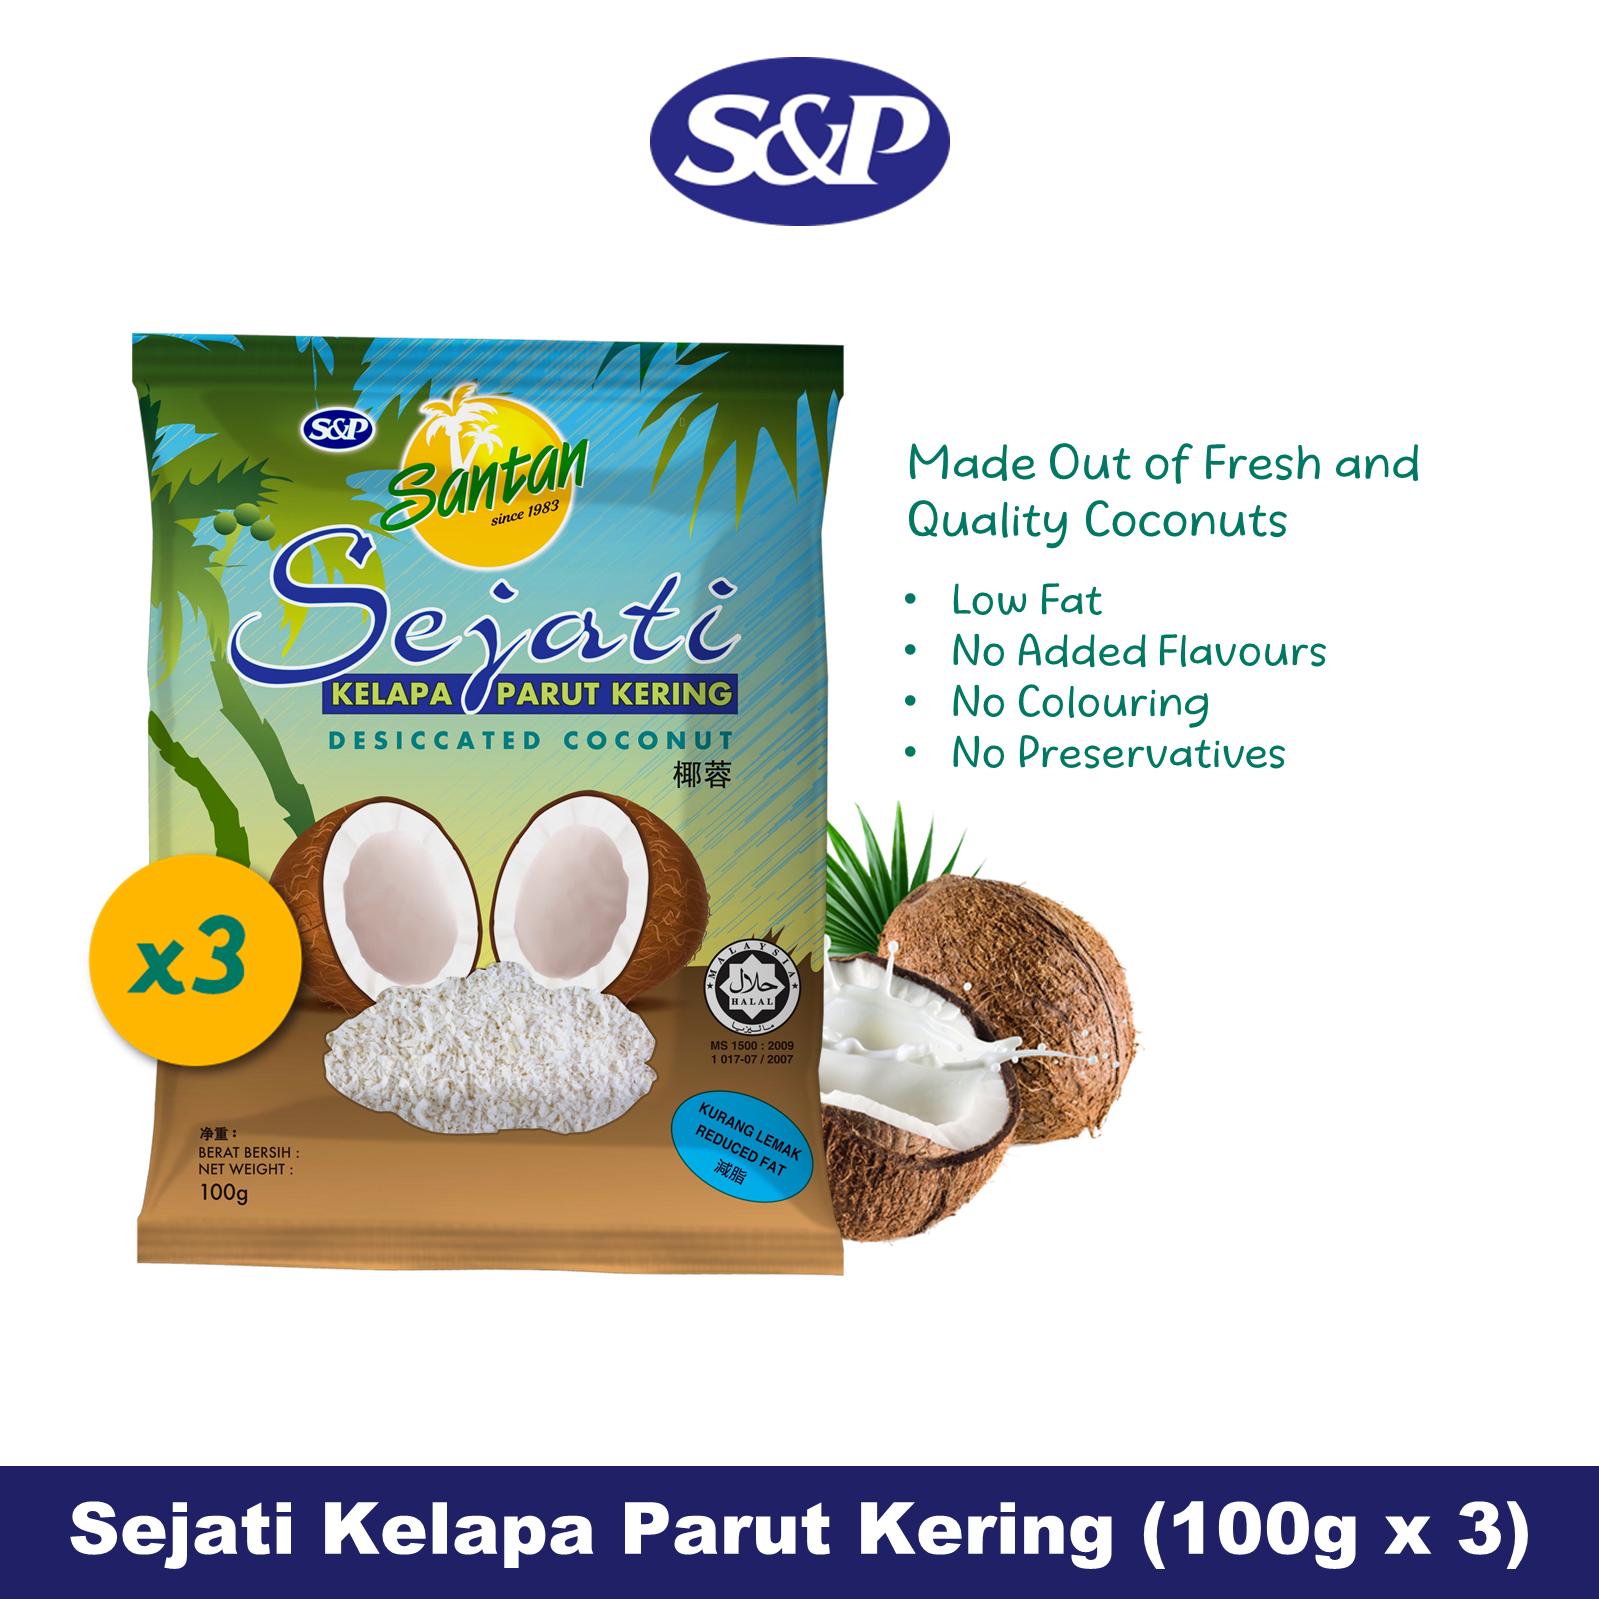 S&P Santan Sejati Desiccated Coconut Kelapa Parut Kering (100g x3)